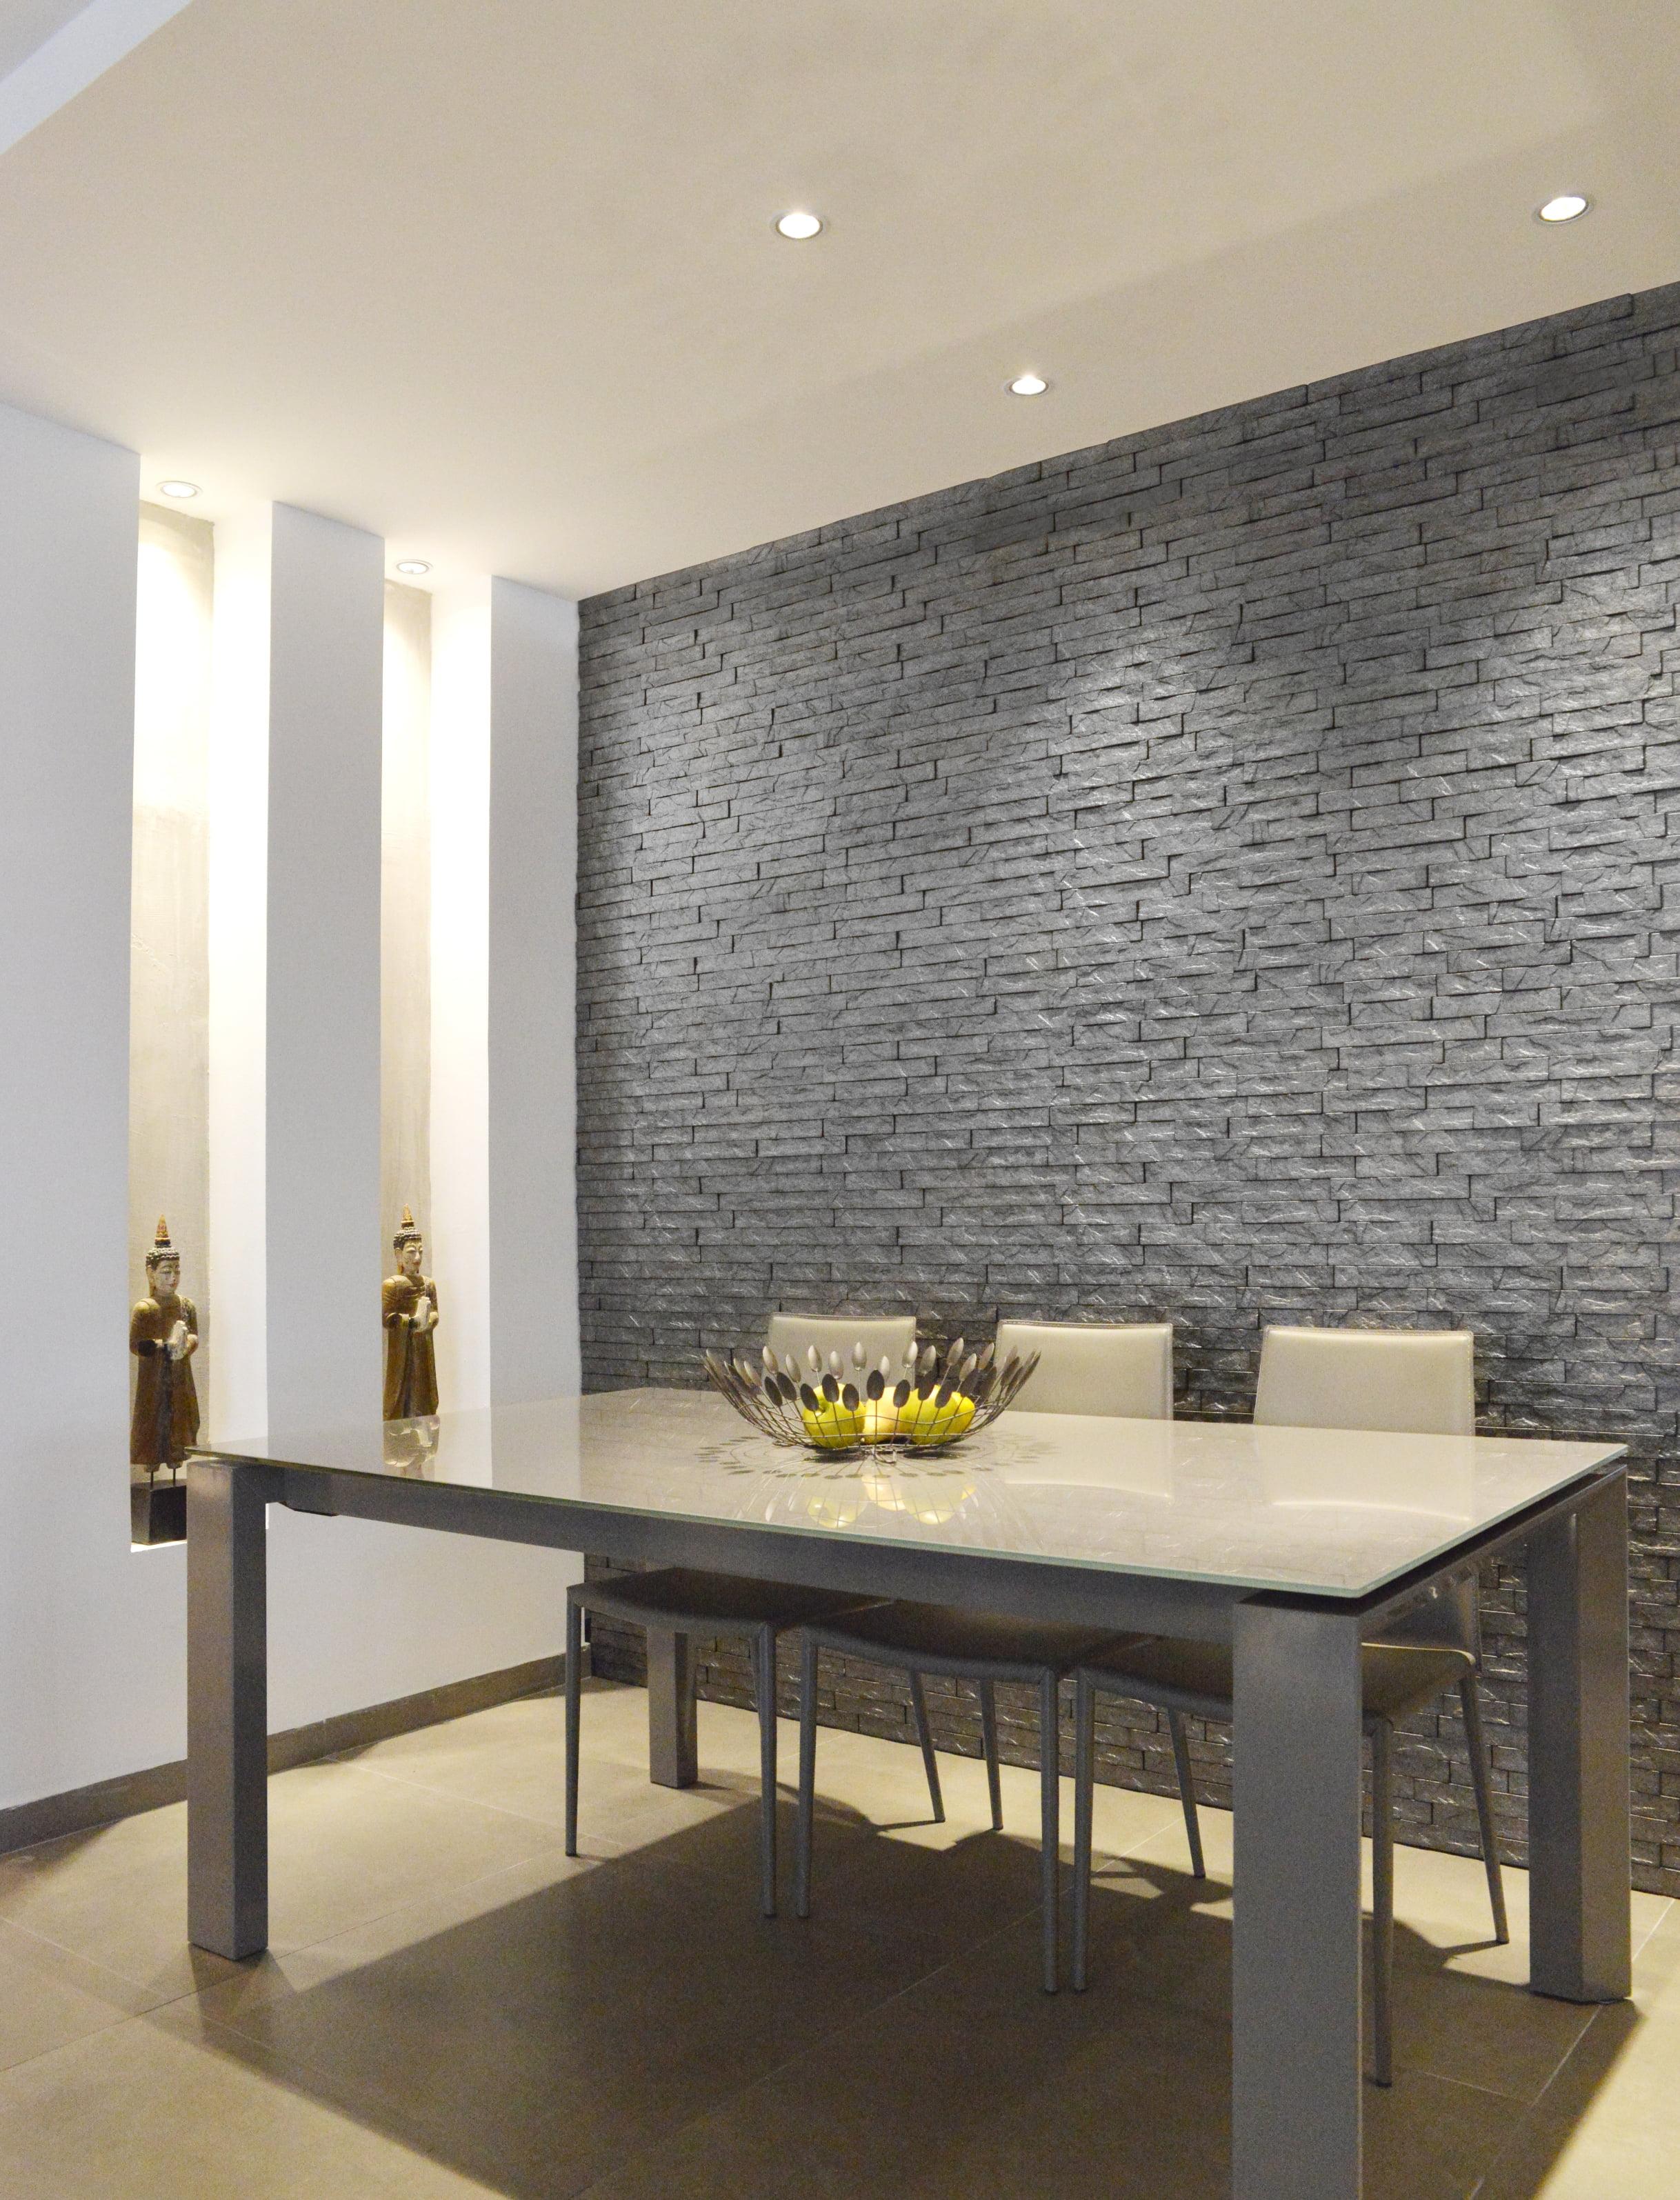 Living Room Wall Design: Interlocking Design For TV